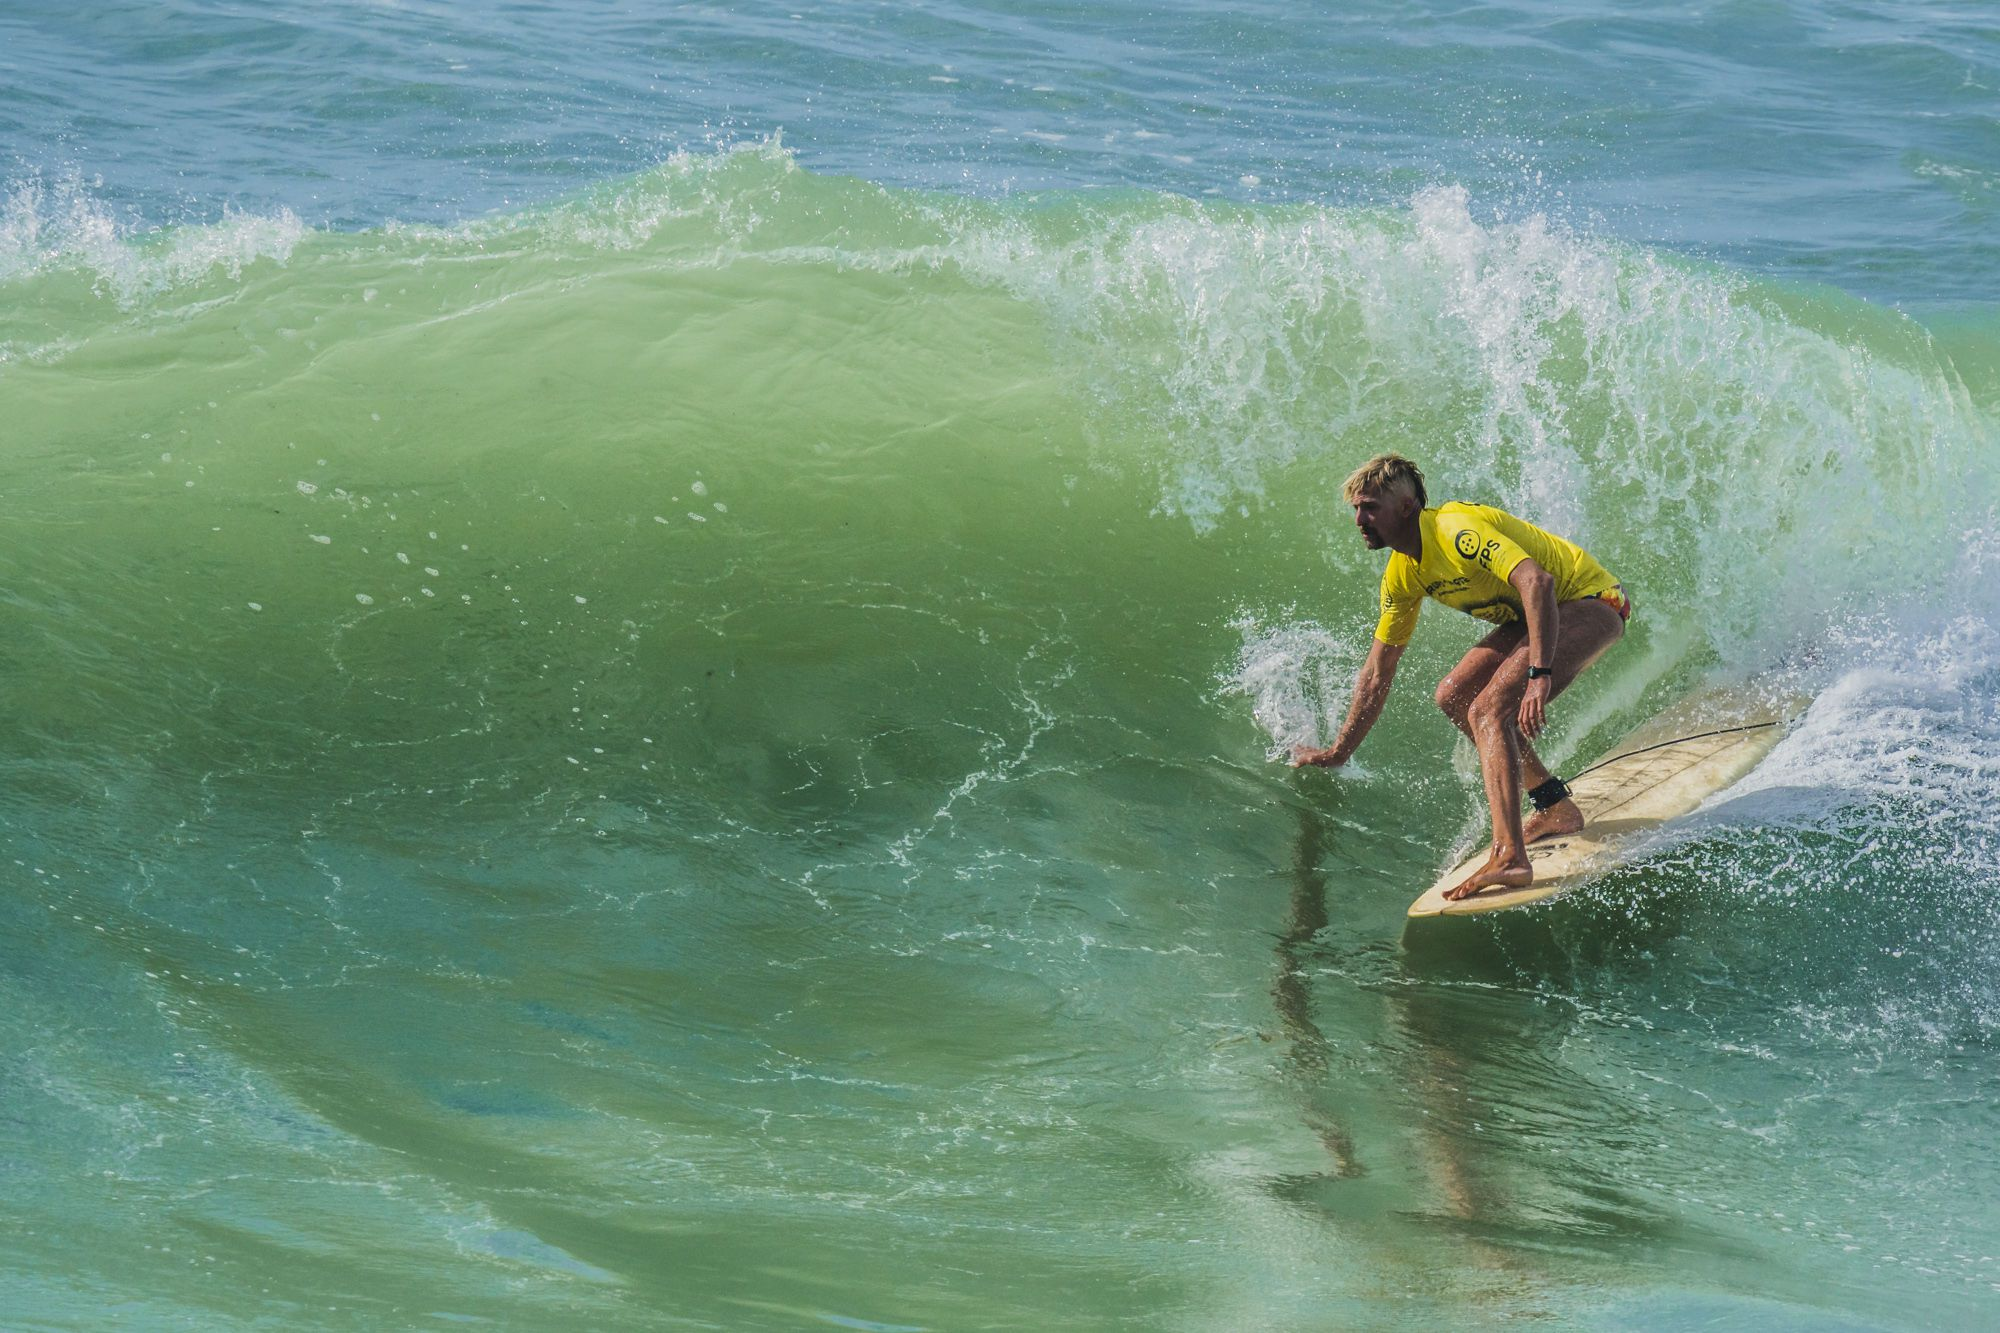 Lukas Stangl surft in der Badehose.